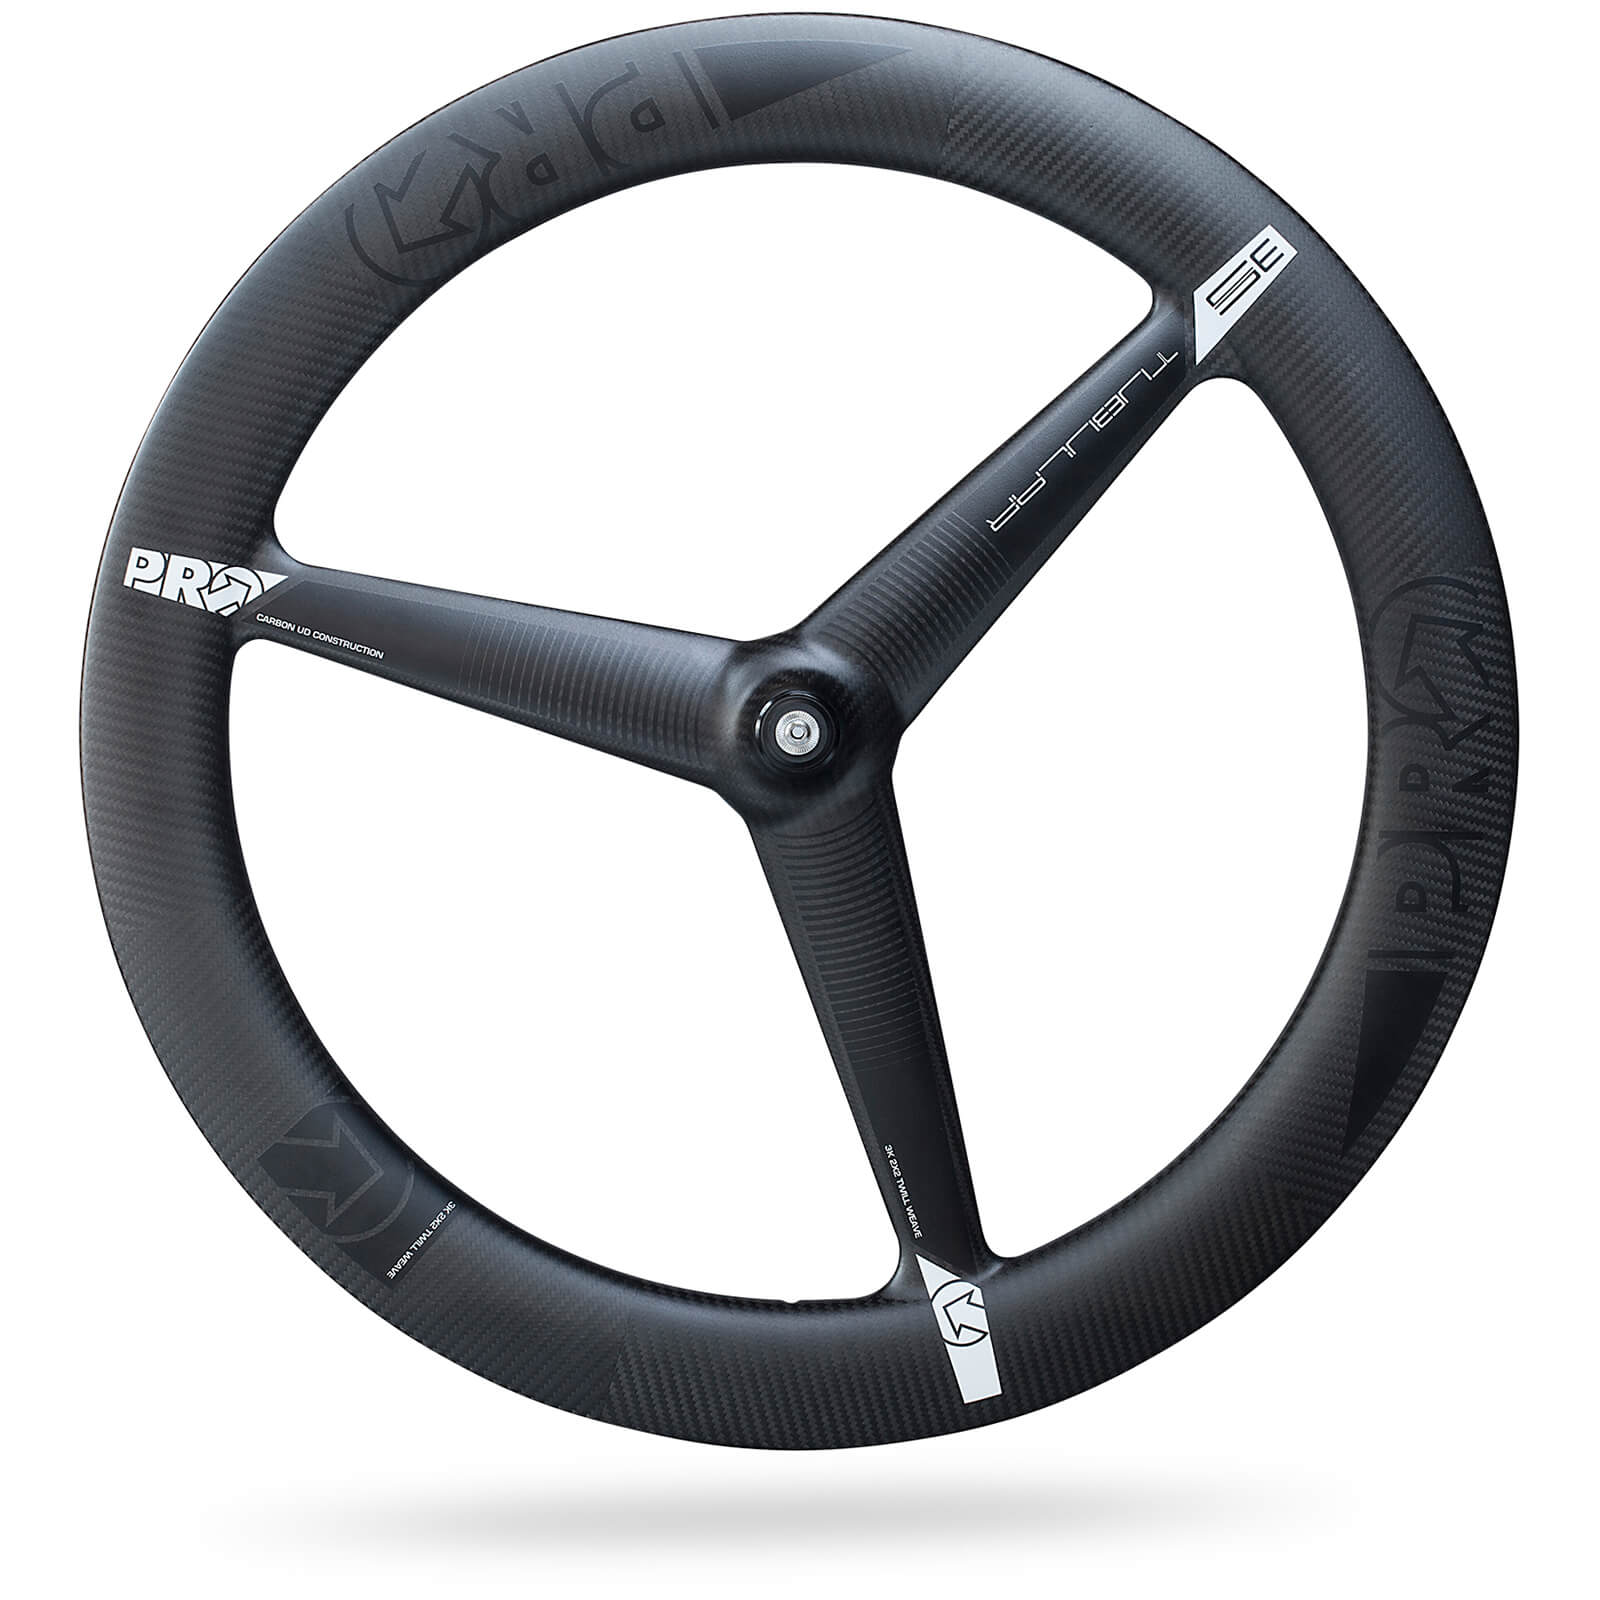 PRO Carbon Tubular 3 Spoke Front Wheel - Ultegra Hub